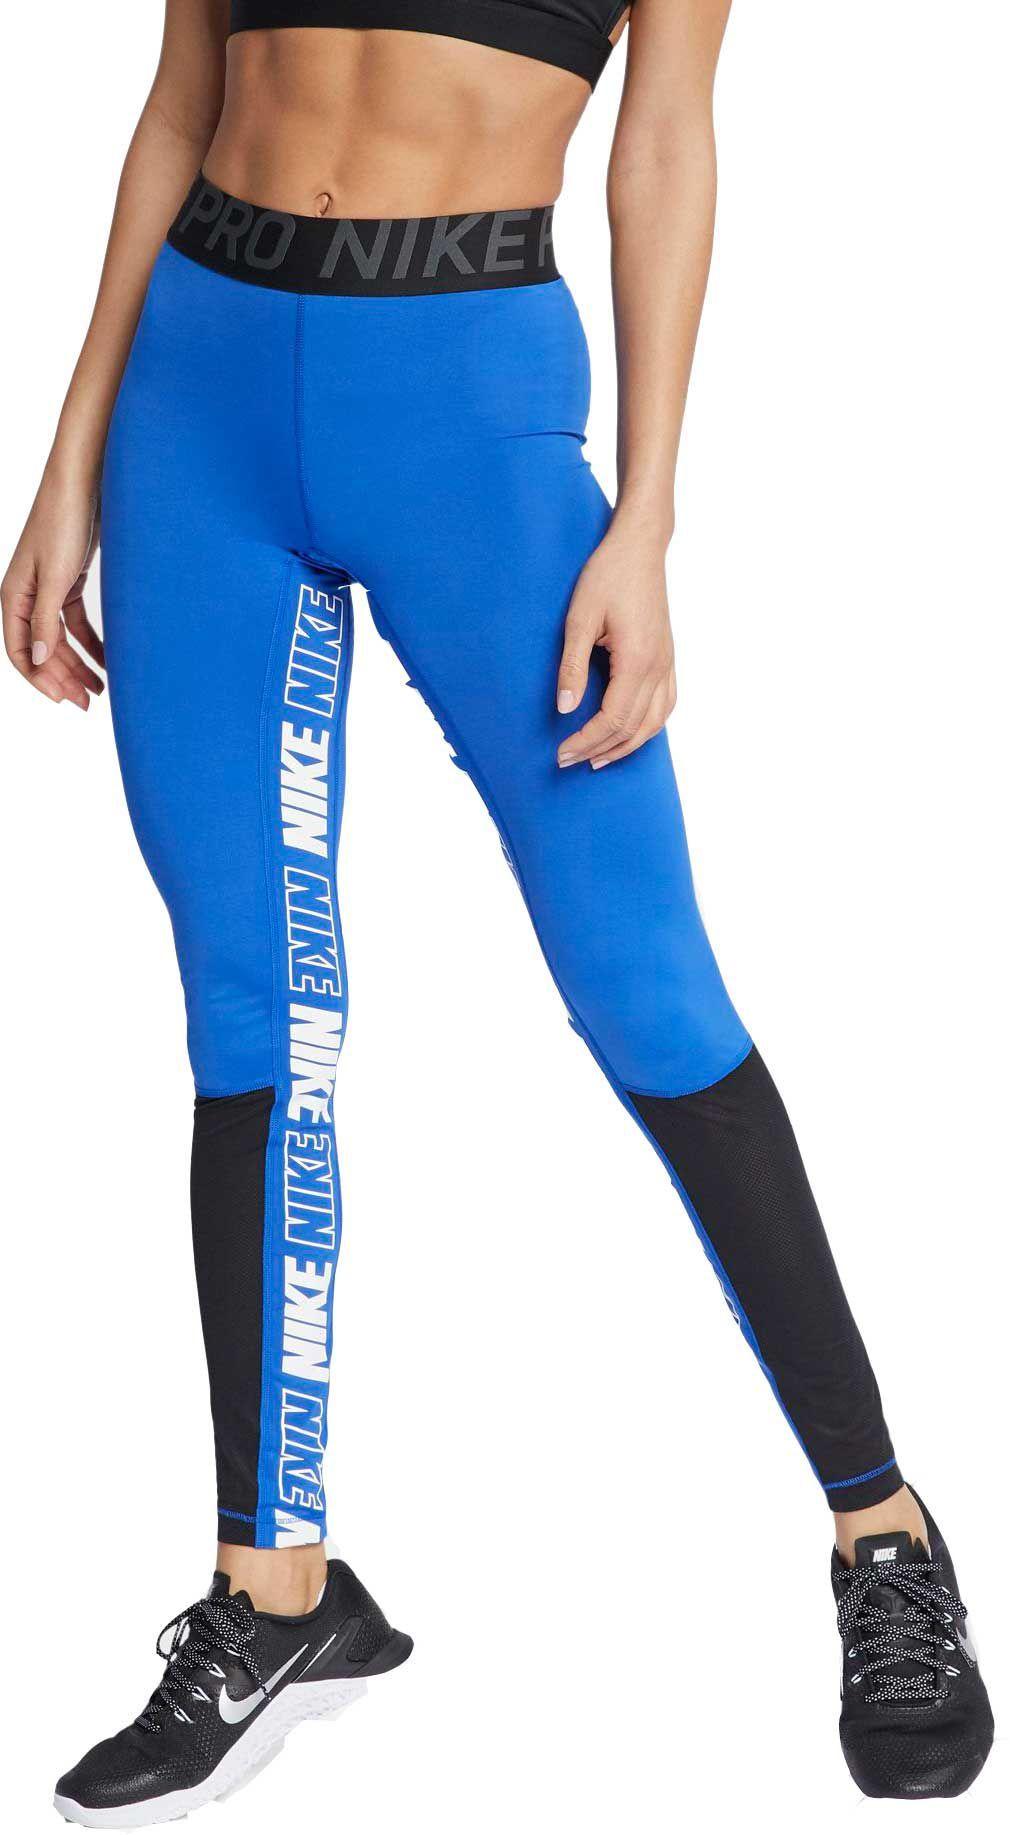 Nike Sport Distort Tights Ladies